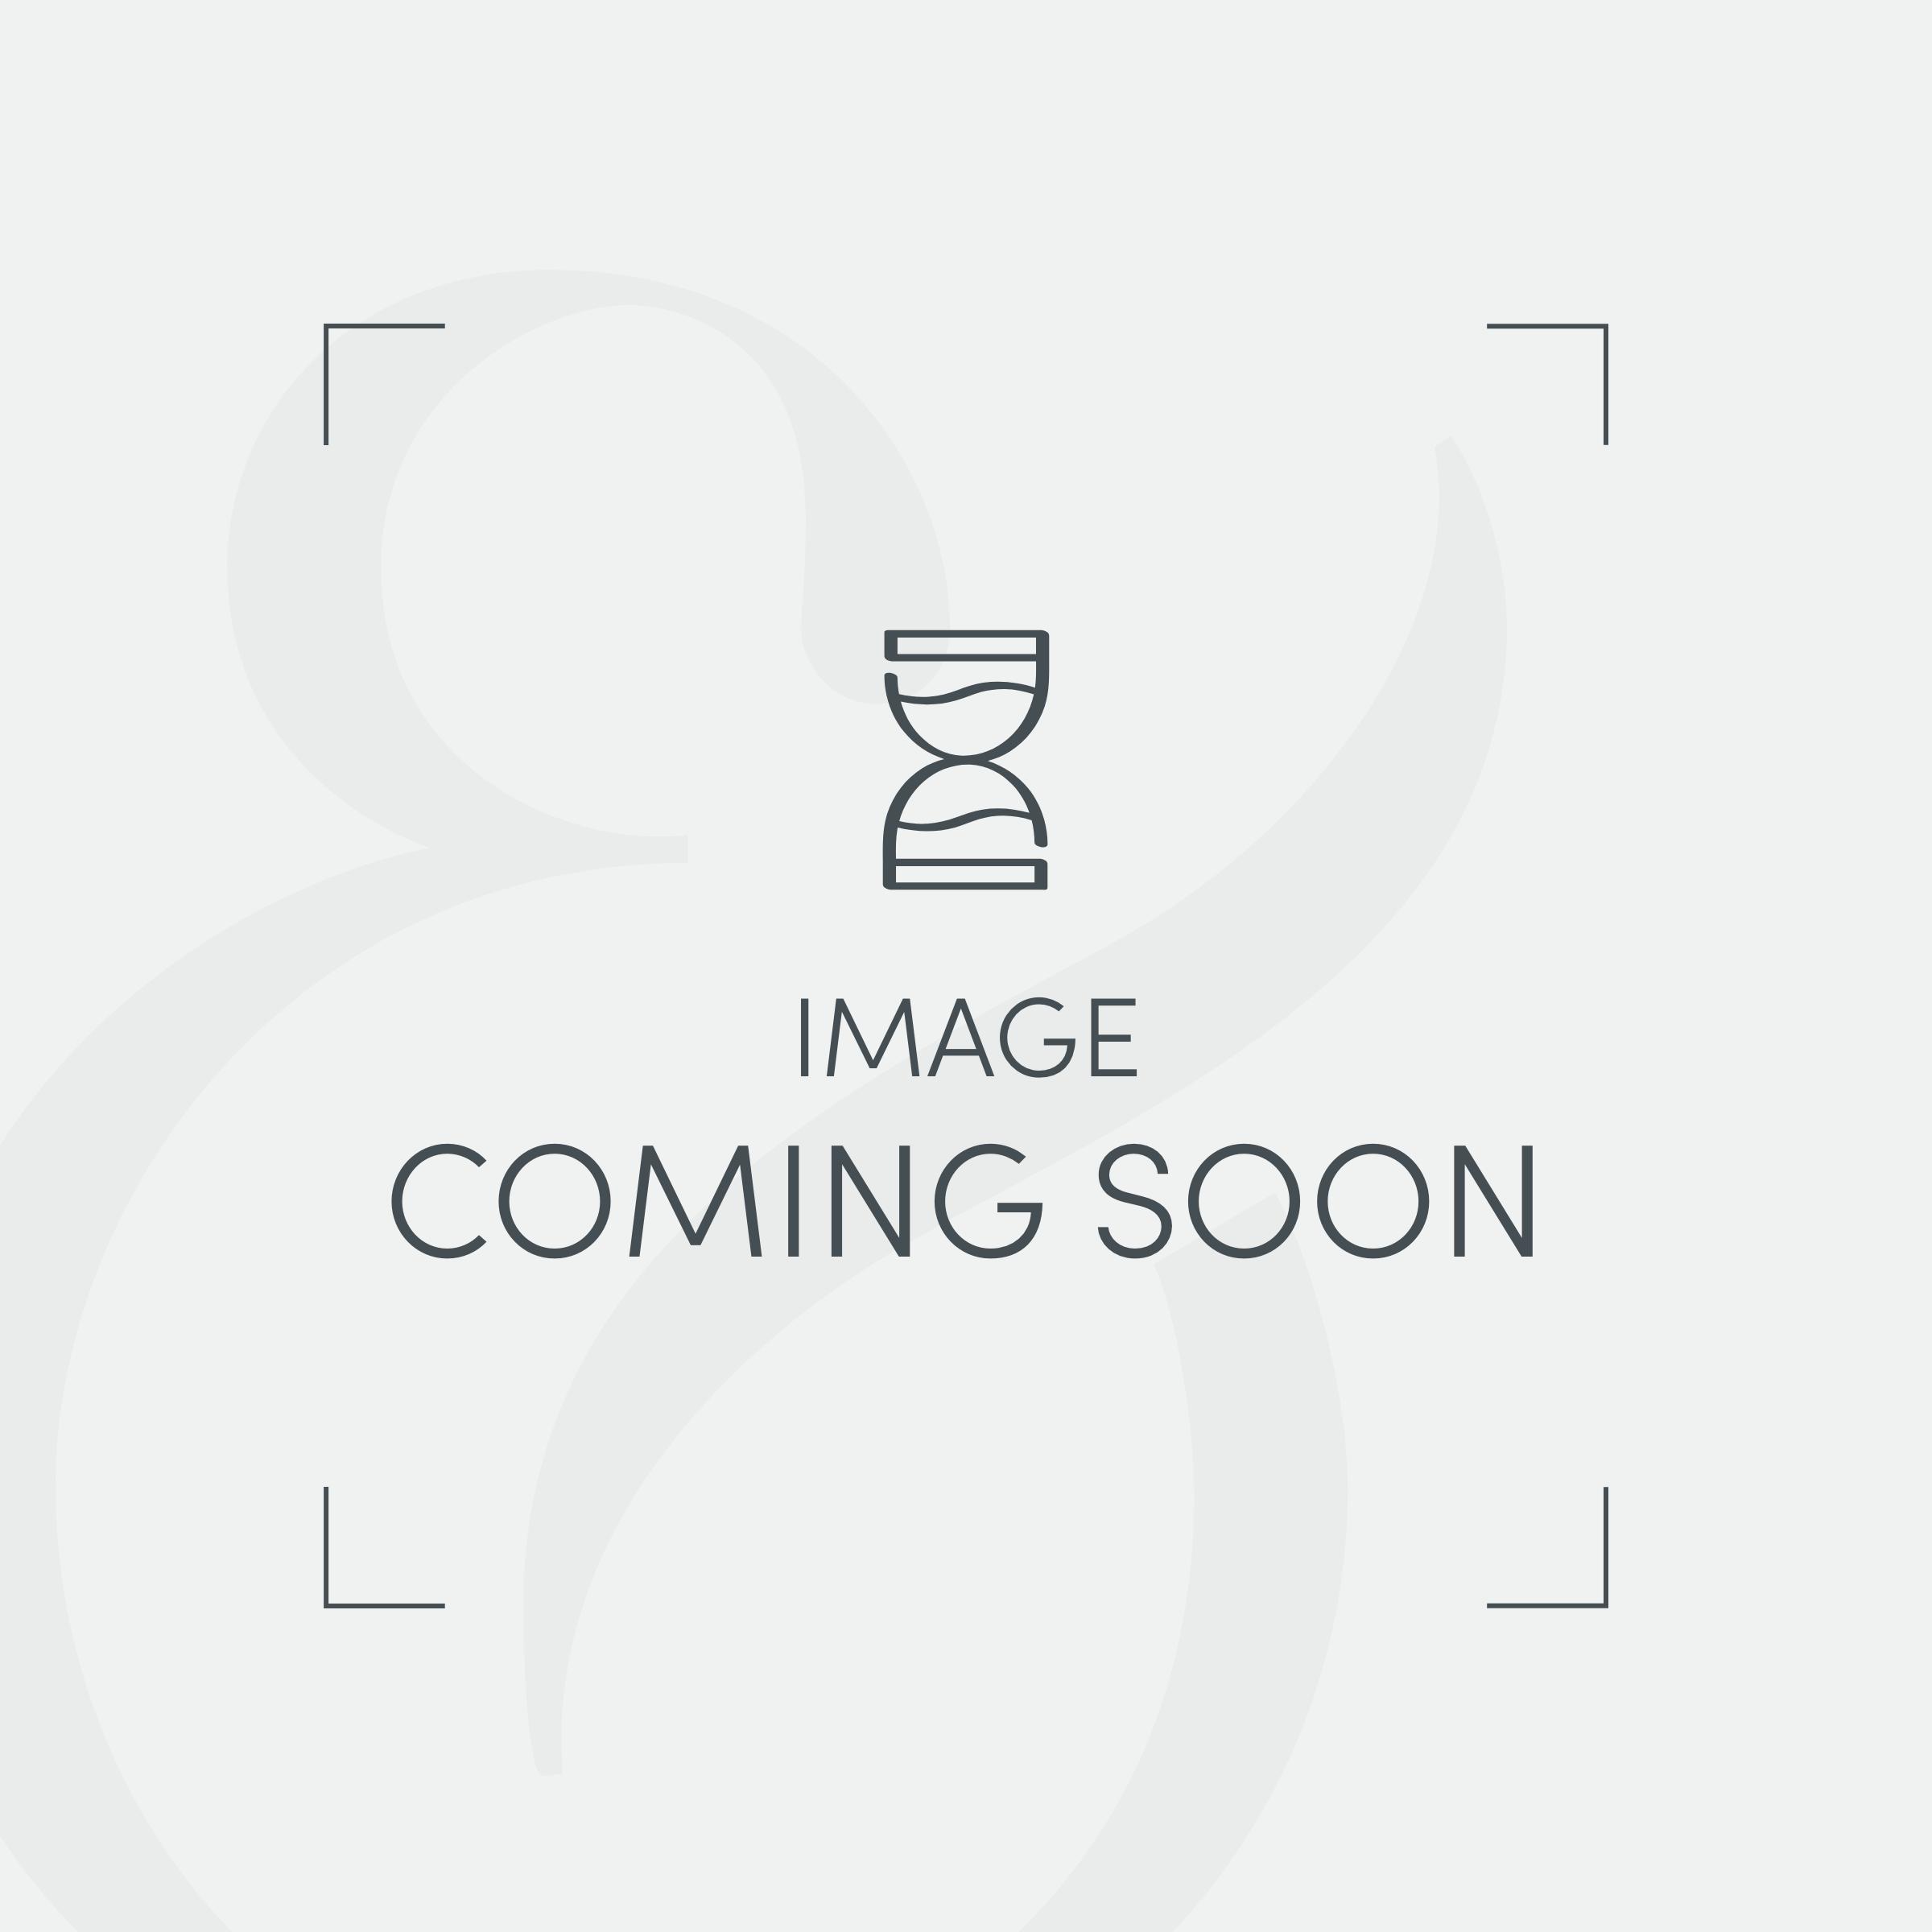 Luxury 600TC Egyptian Cotton Bundle - Light Grey - King (Duvet Cover, Deep Fitted Sheet, Standard Oxford Pillowcase Pair)